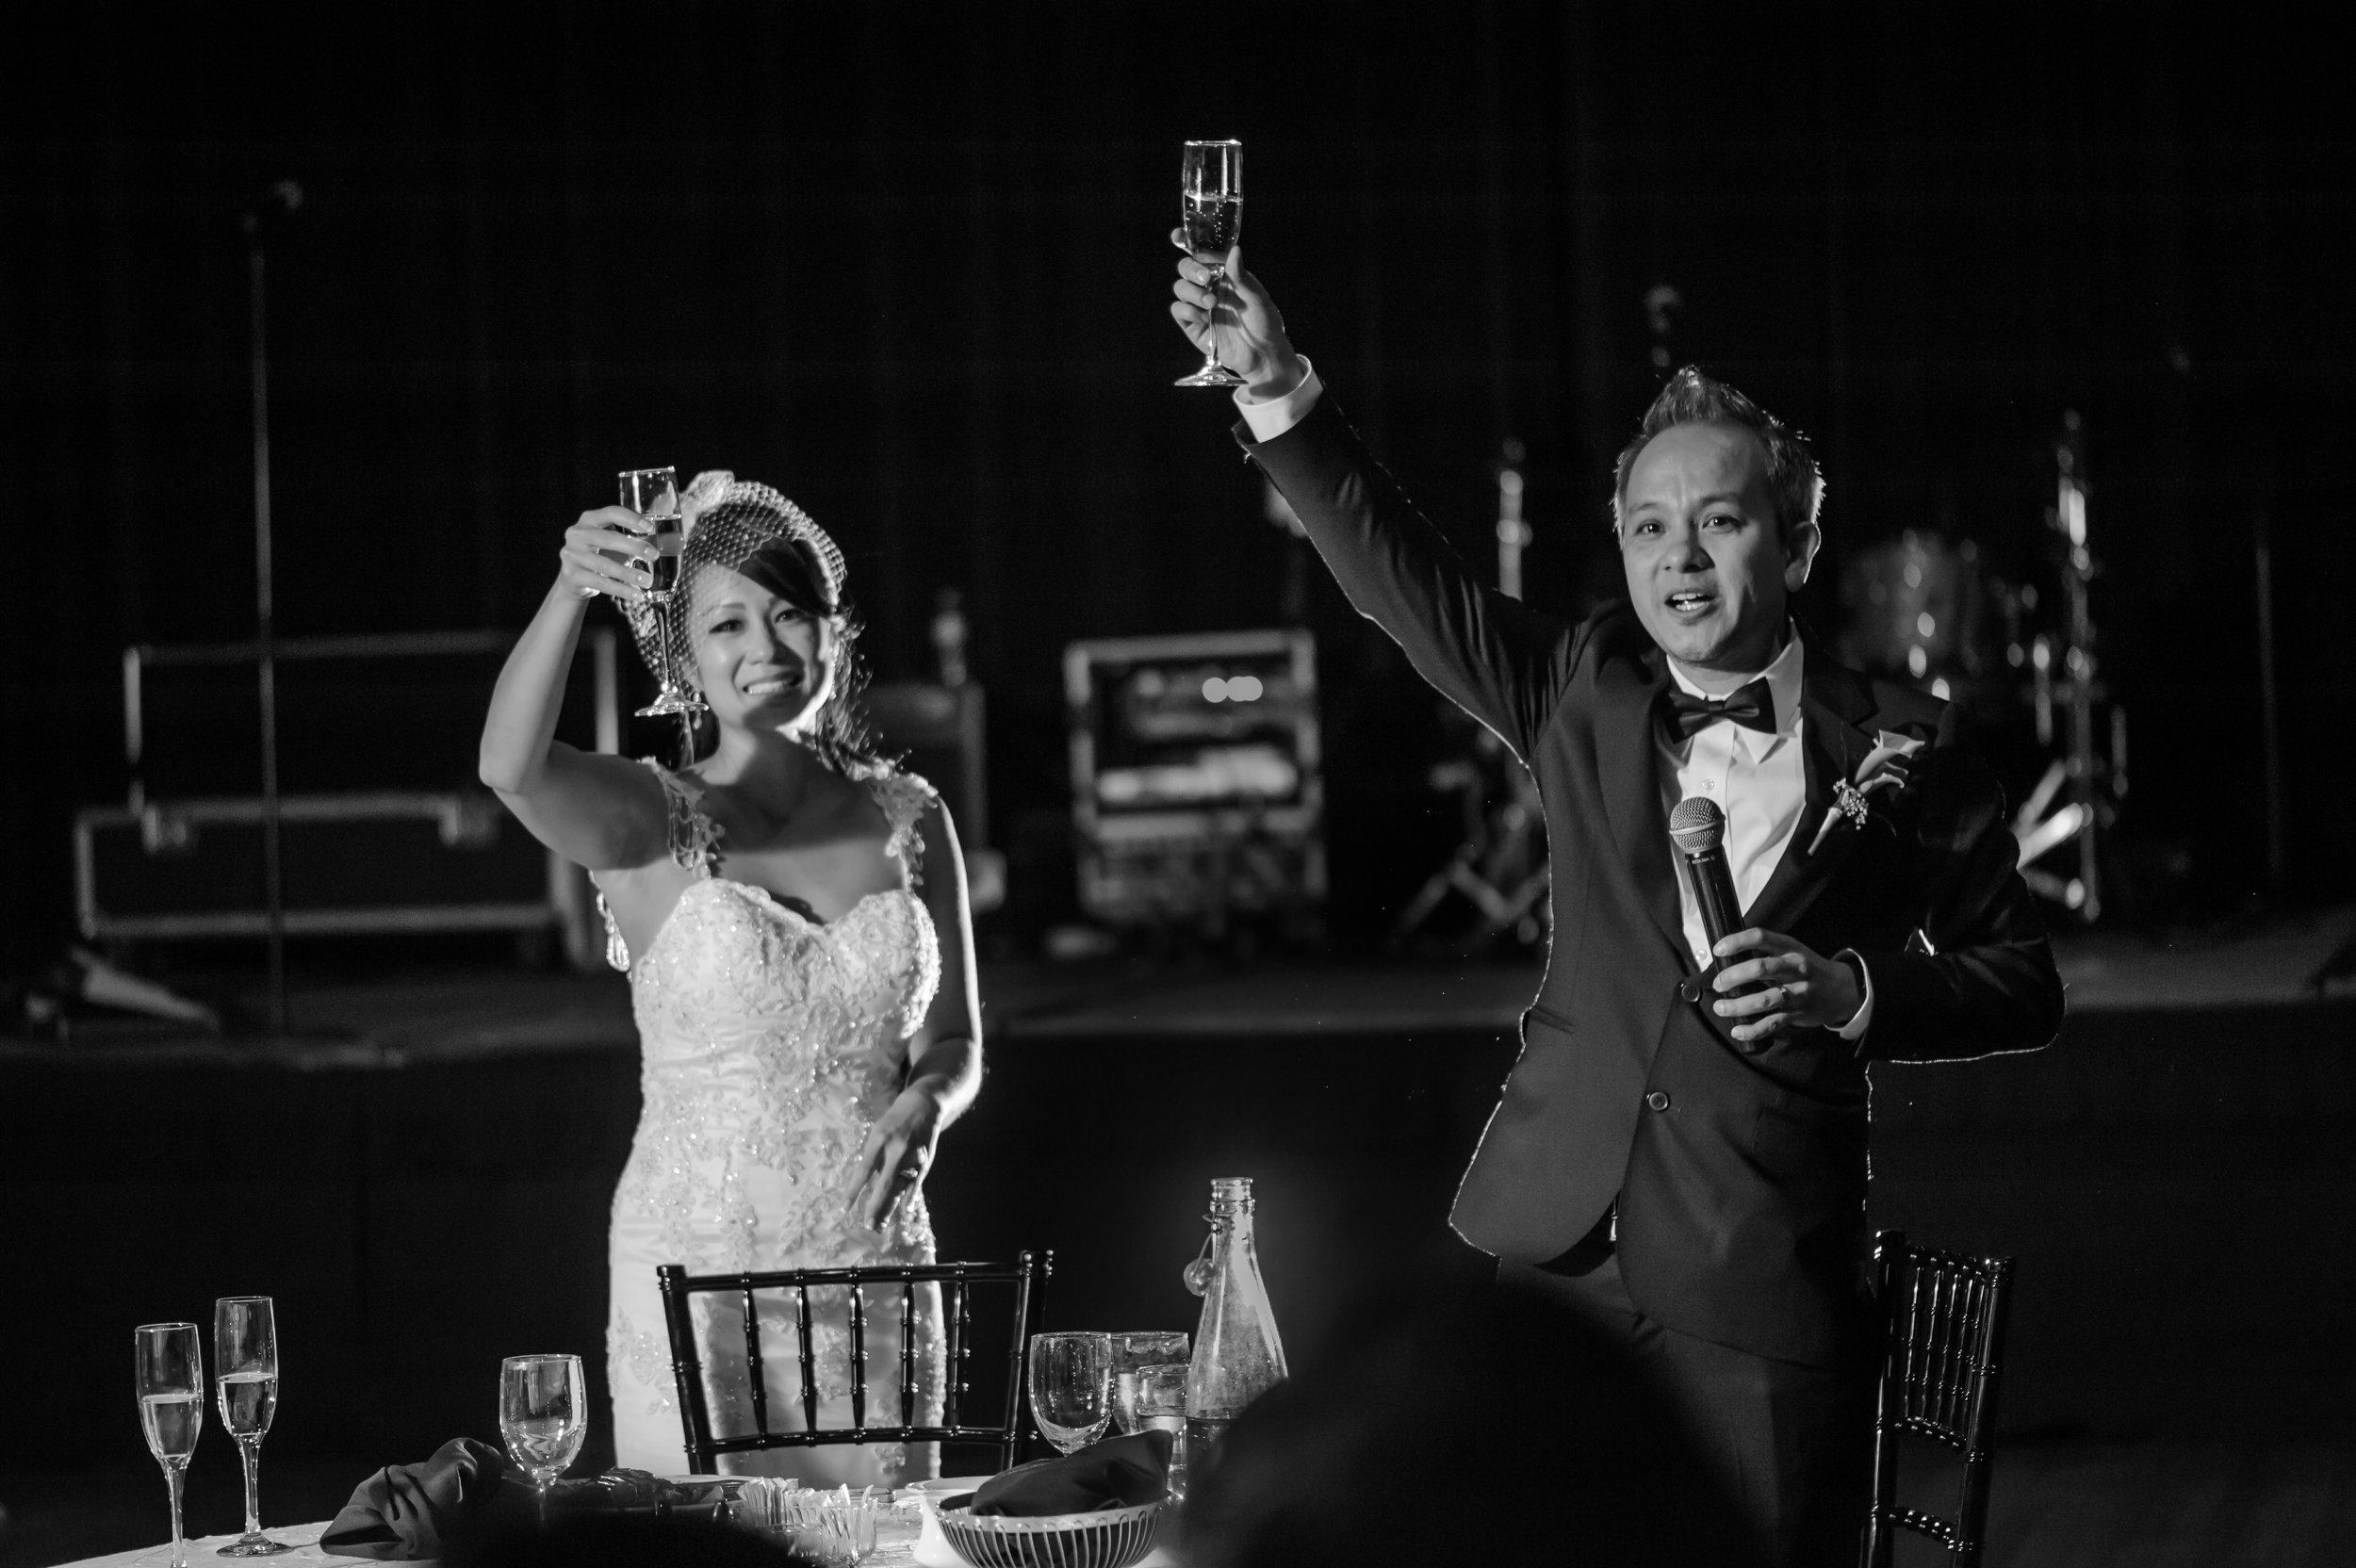 camilla-thuy-065-memorial-auditorium-sacramento-wedding-photographer-katherine-nicole-photography.JPG